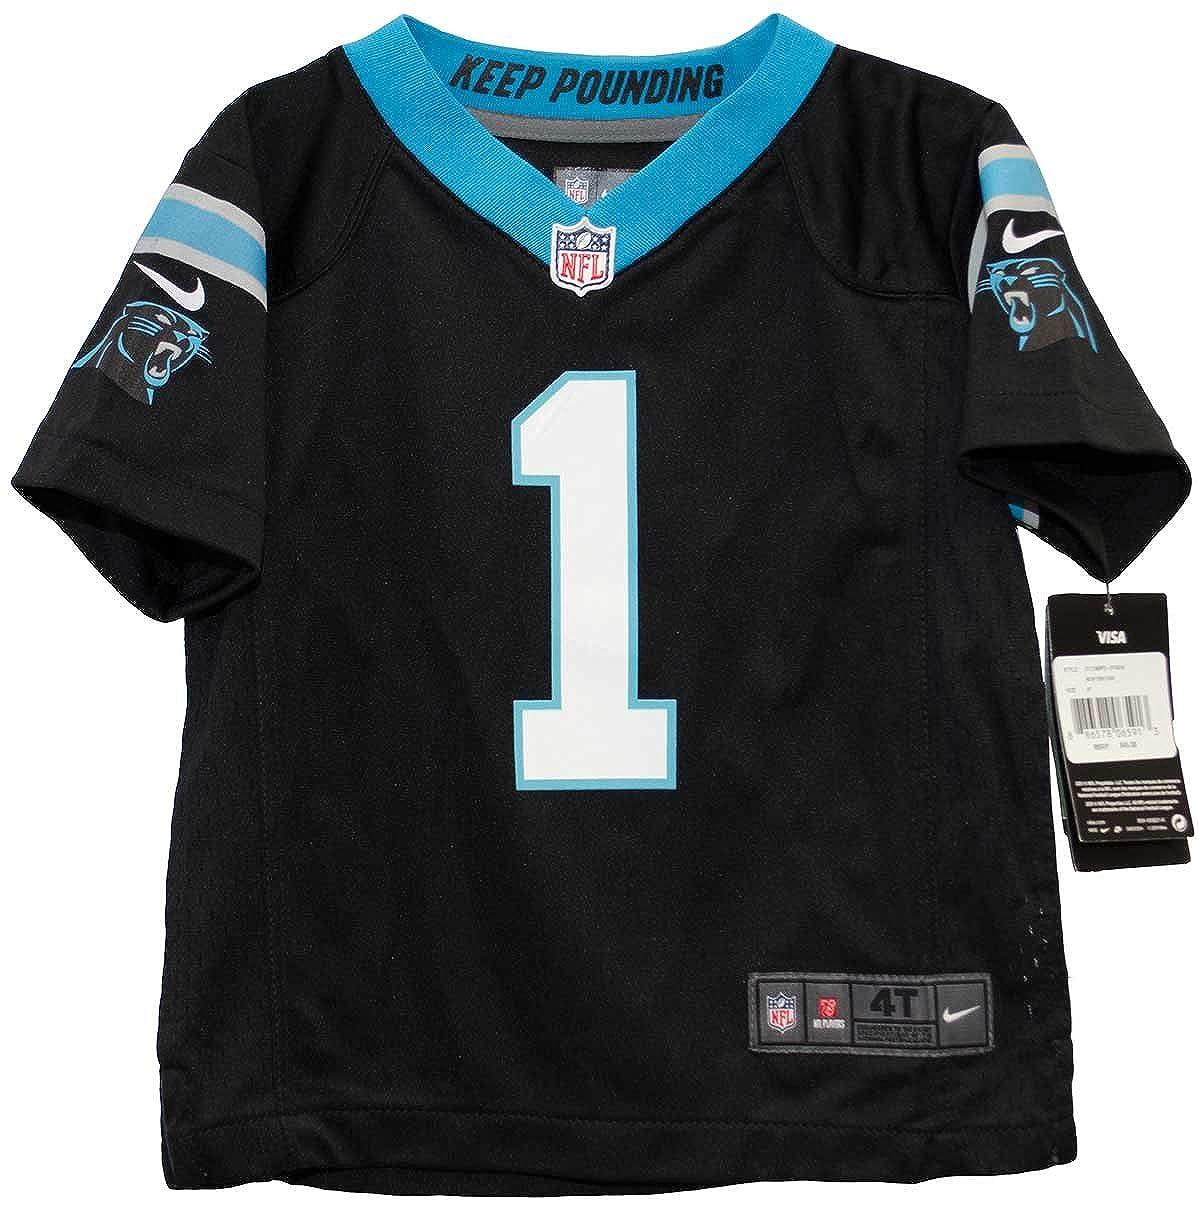 eea8d583 Amazon.com: Cam Newton Carolina Panthers Nike Game Toddler Jersey (4T):  Clothing